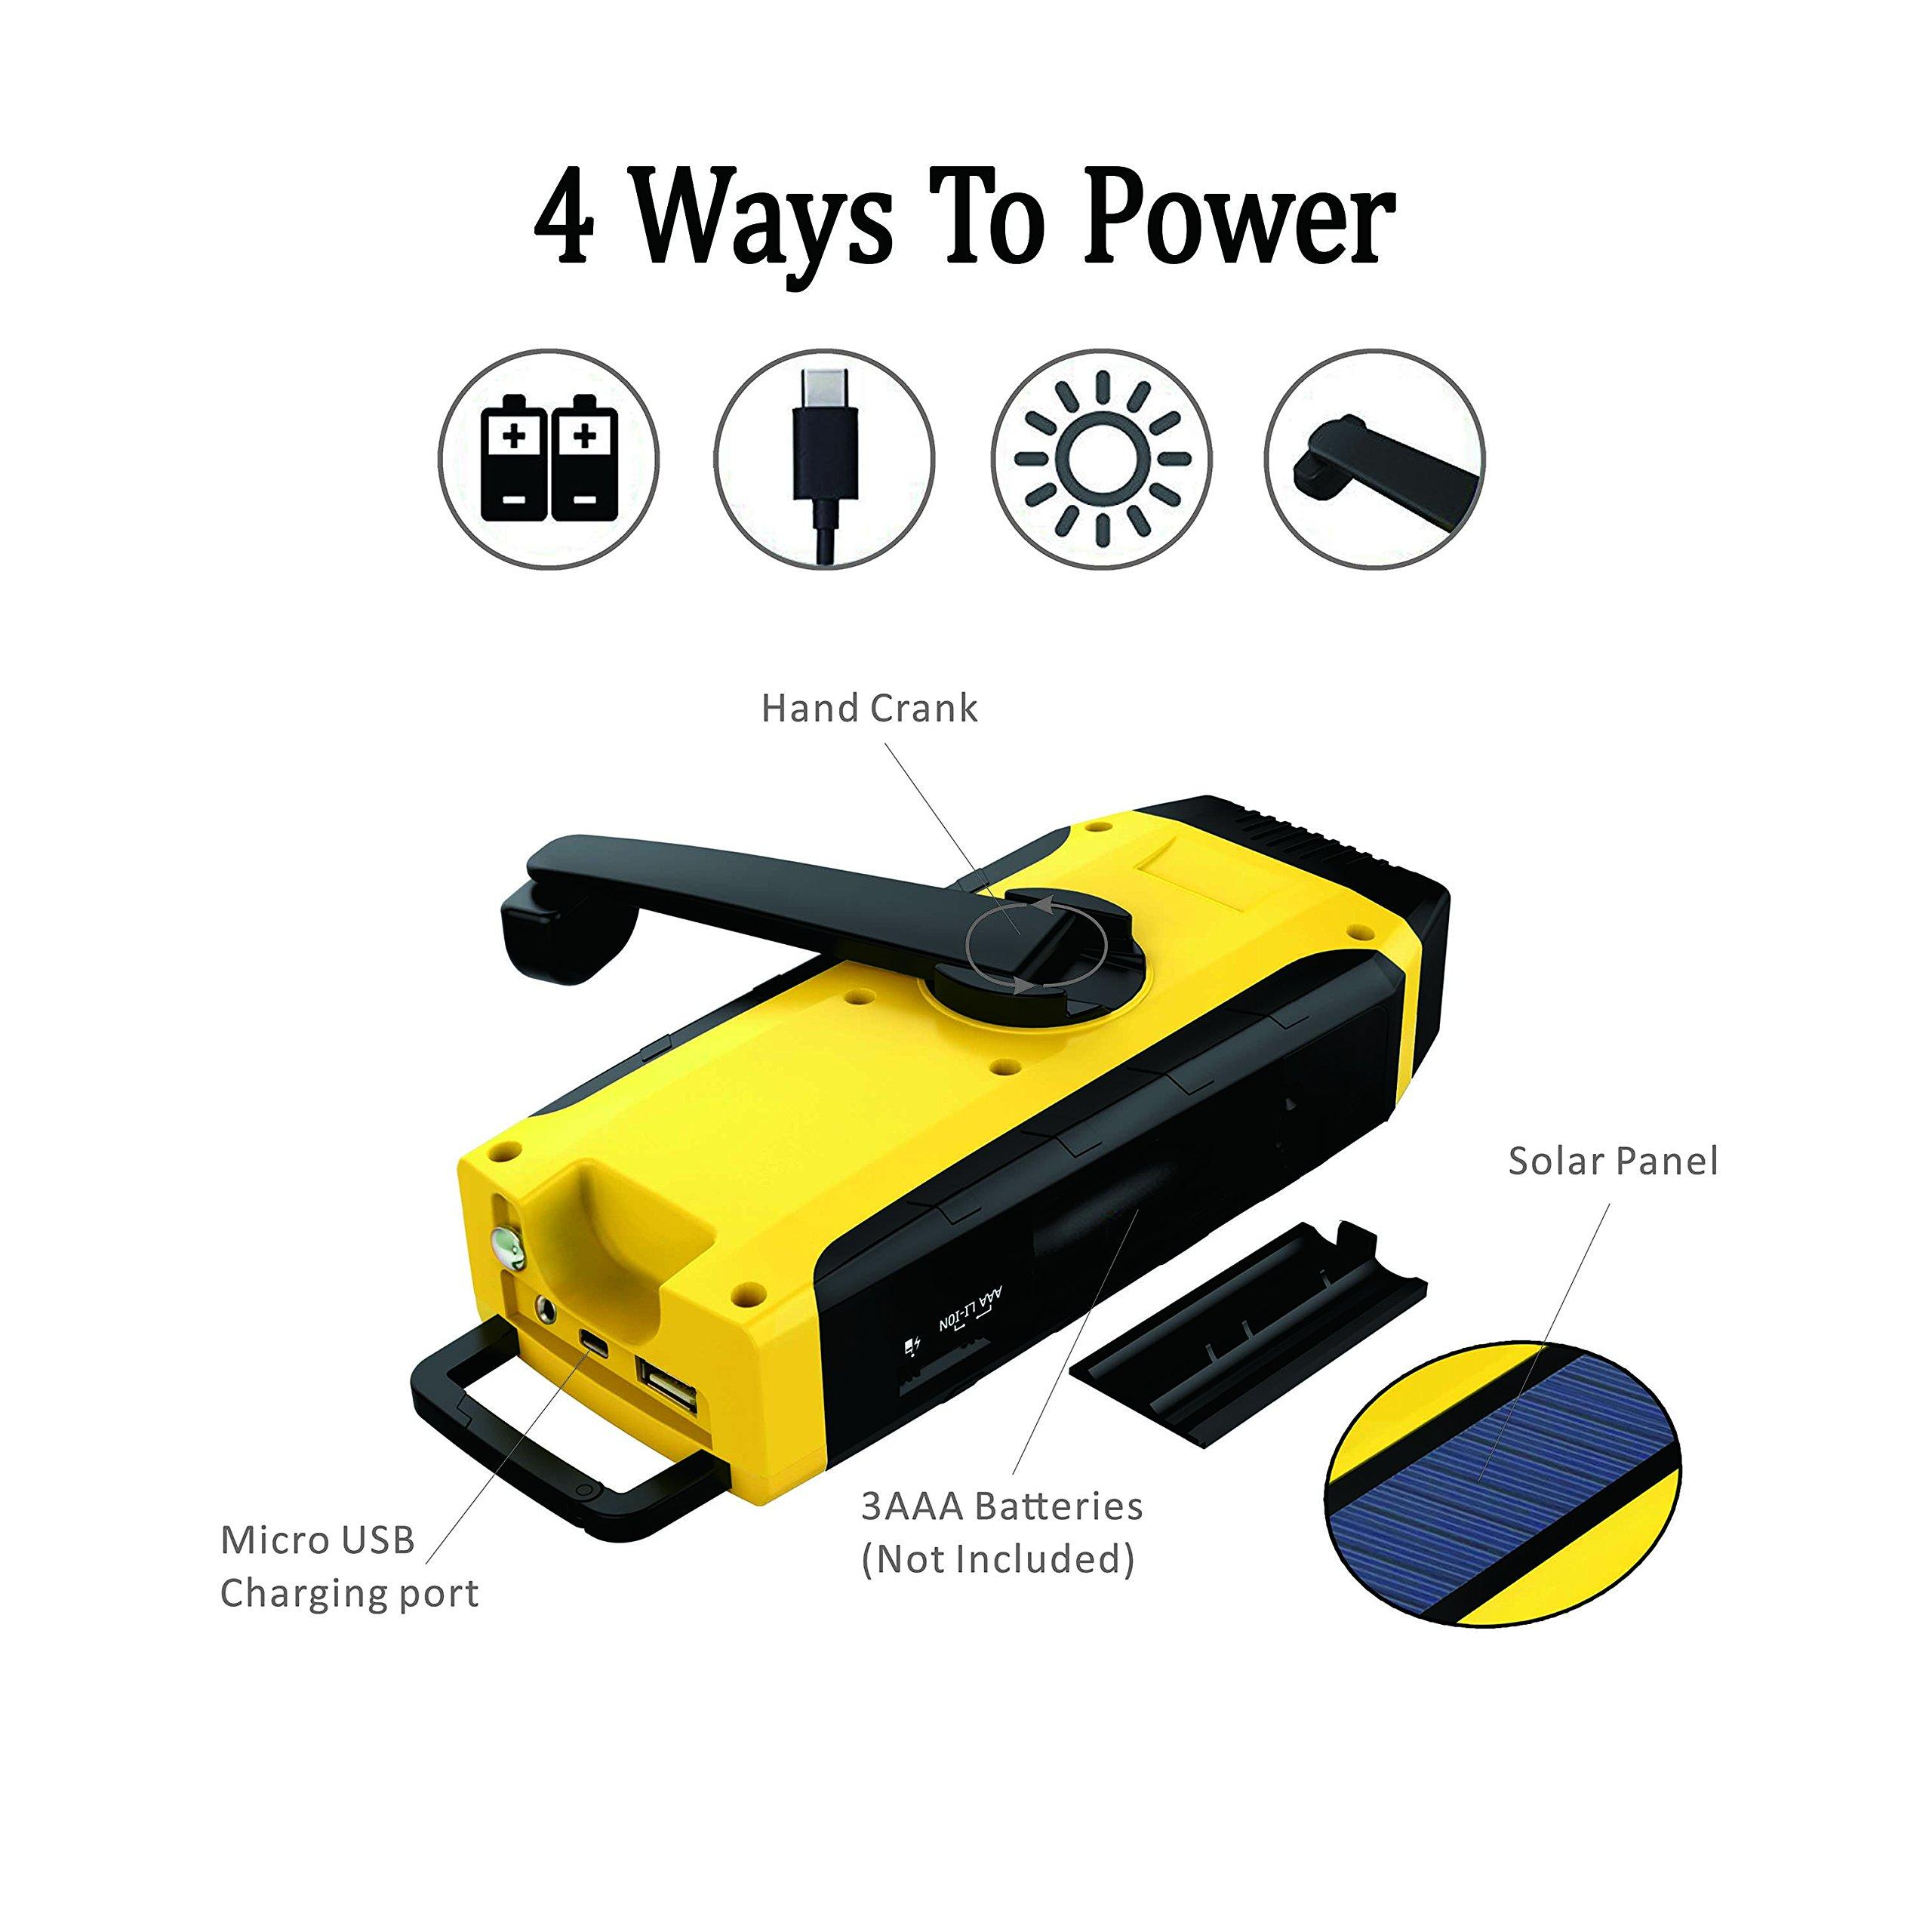 RunningSnail AM/FM NOAA Weather Emergency Solar Digital Crank Radio with 3W LED Flashlight, SOS Alarm & 2000MAh Power Bank(Yellow) … by RunningSnail (Image #3)